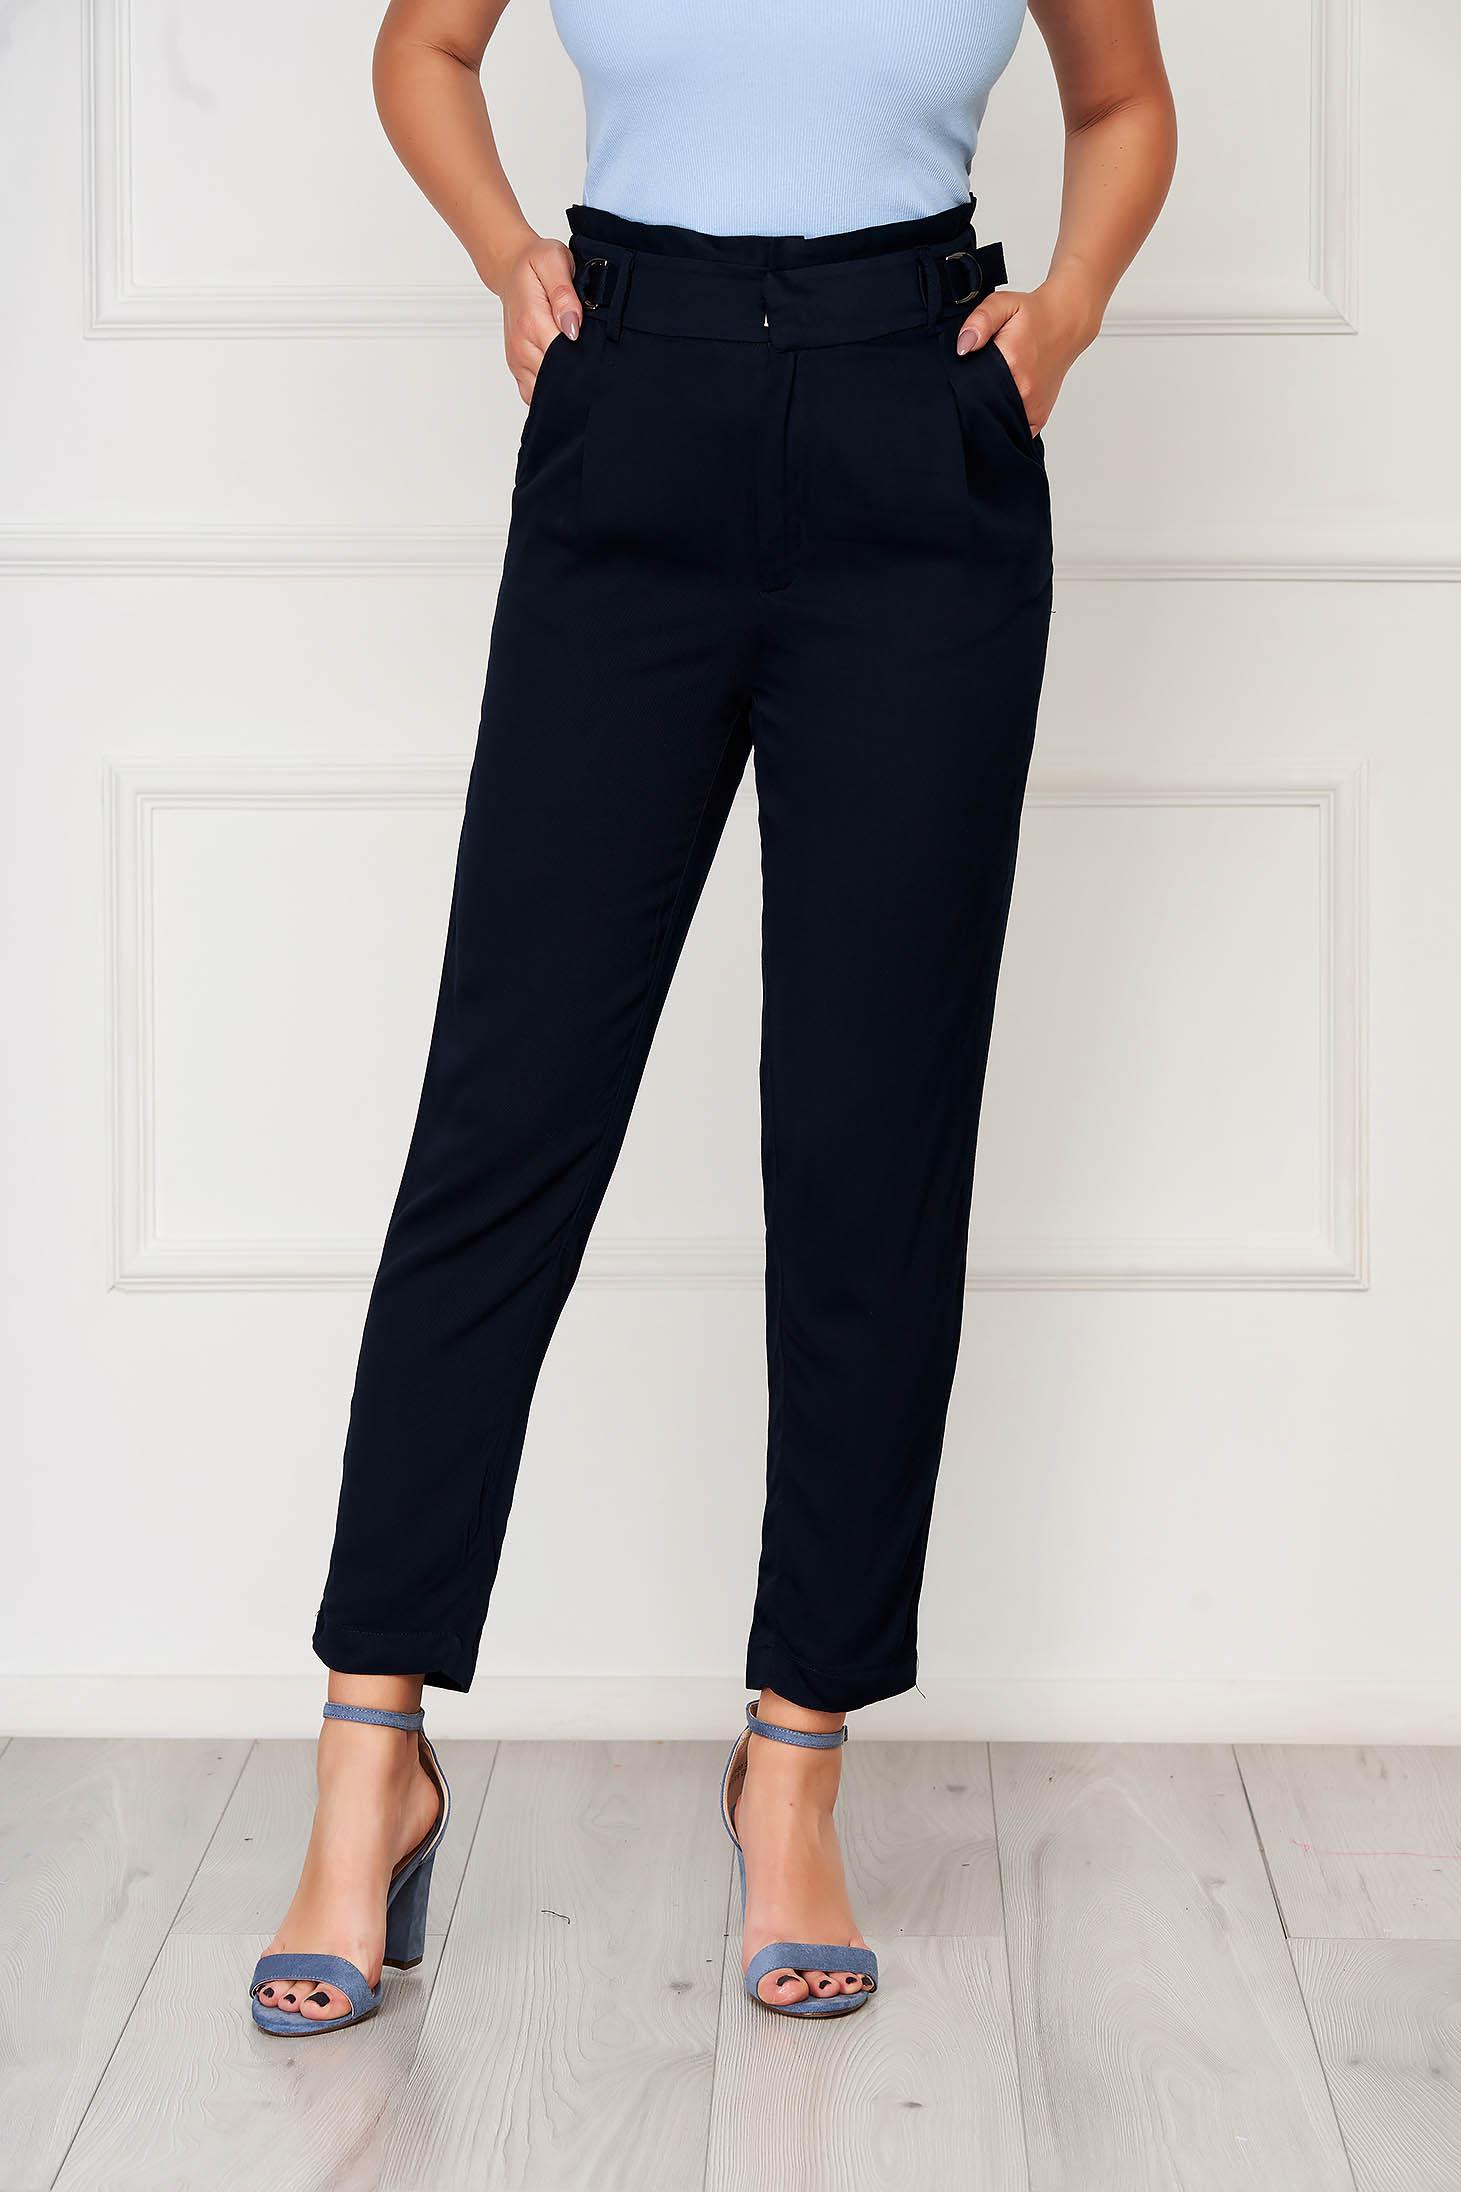 Darkblue trousers office high waisted elastic waist soft fabric